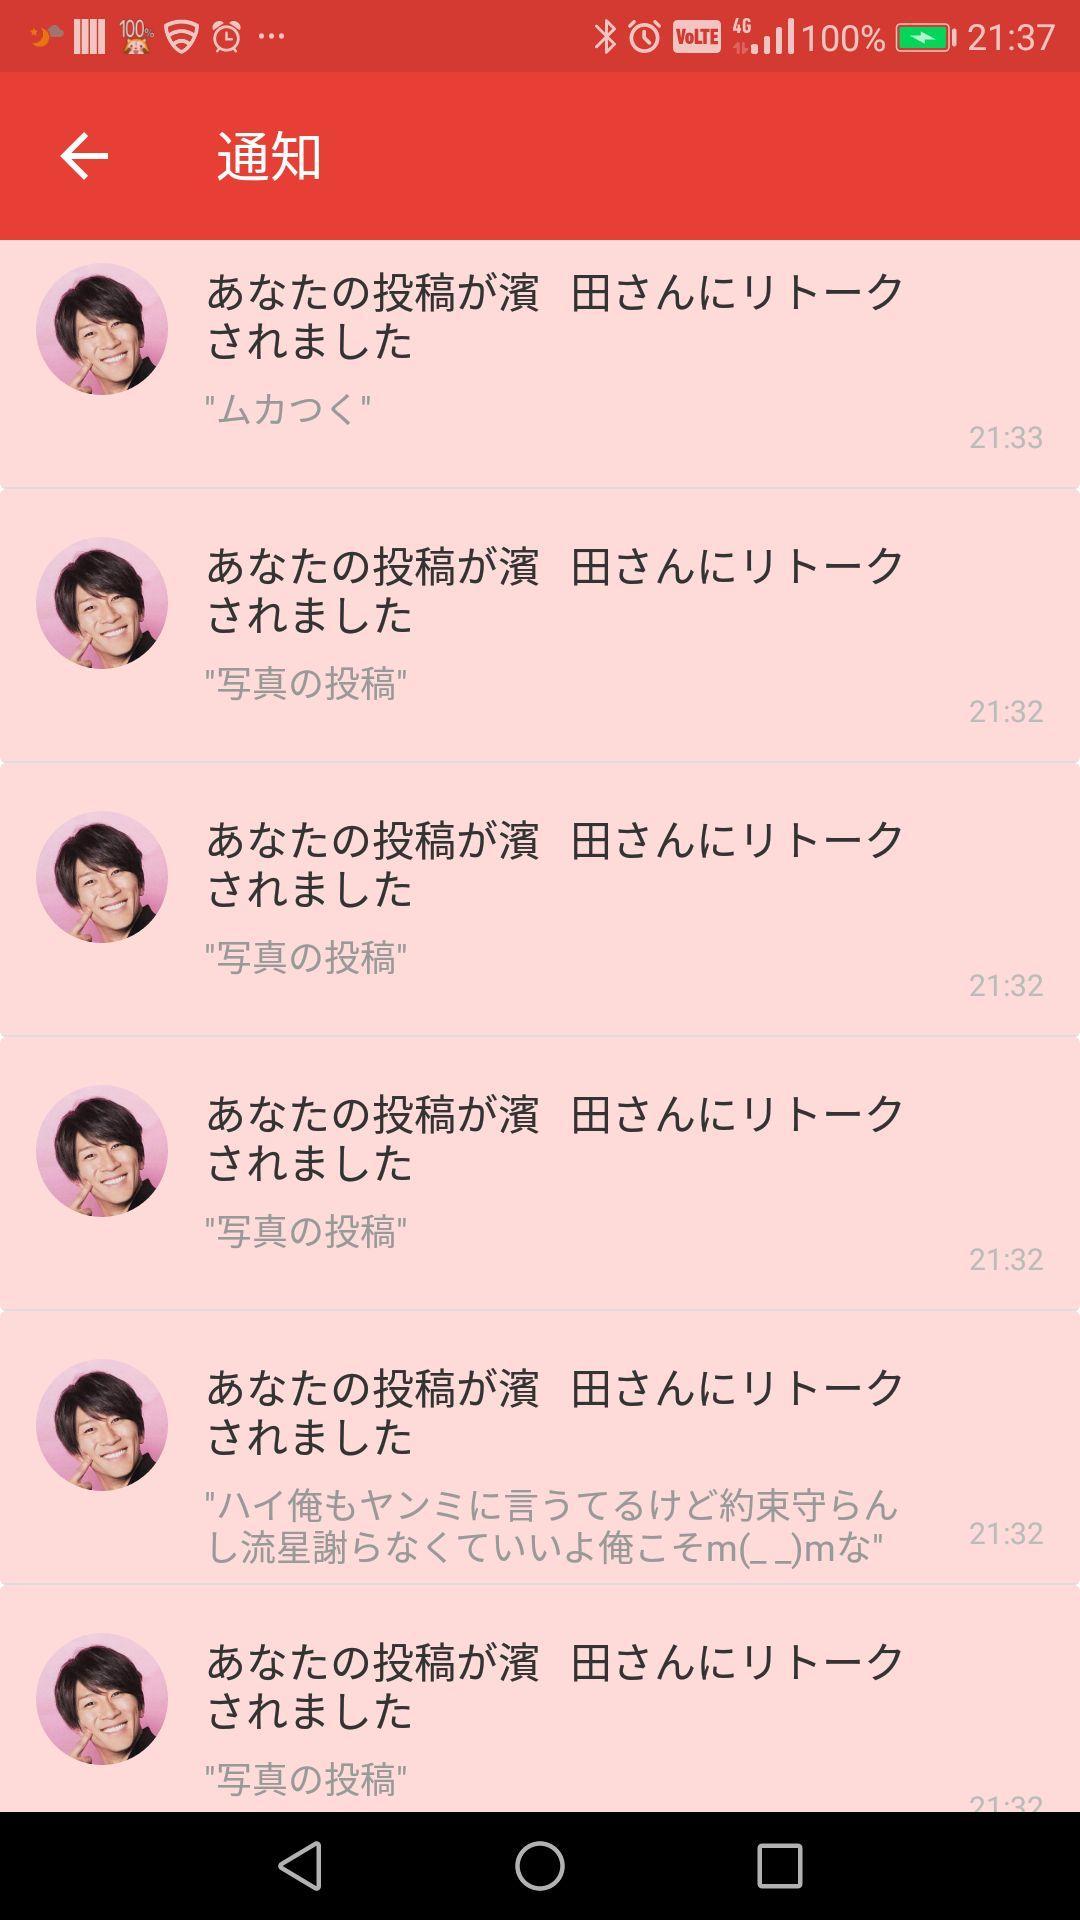 小瀧望 line